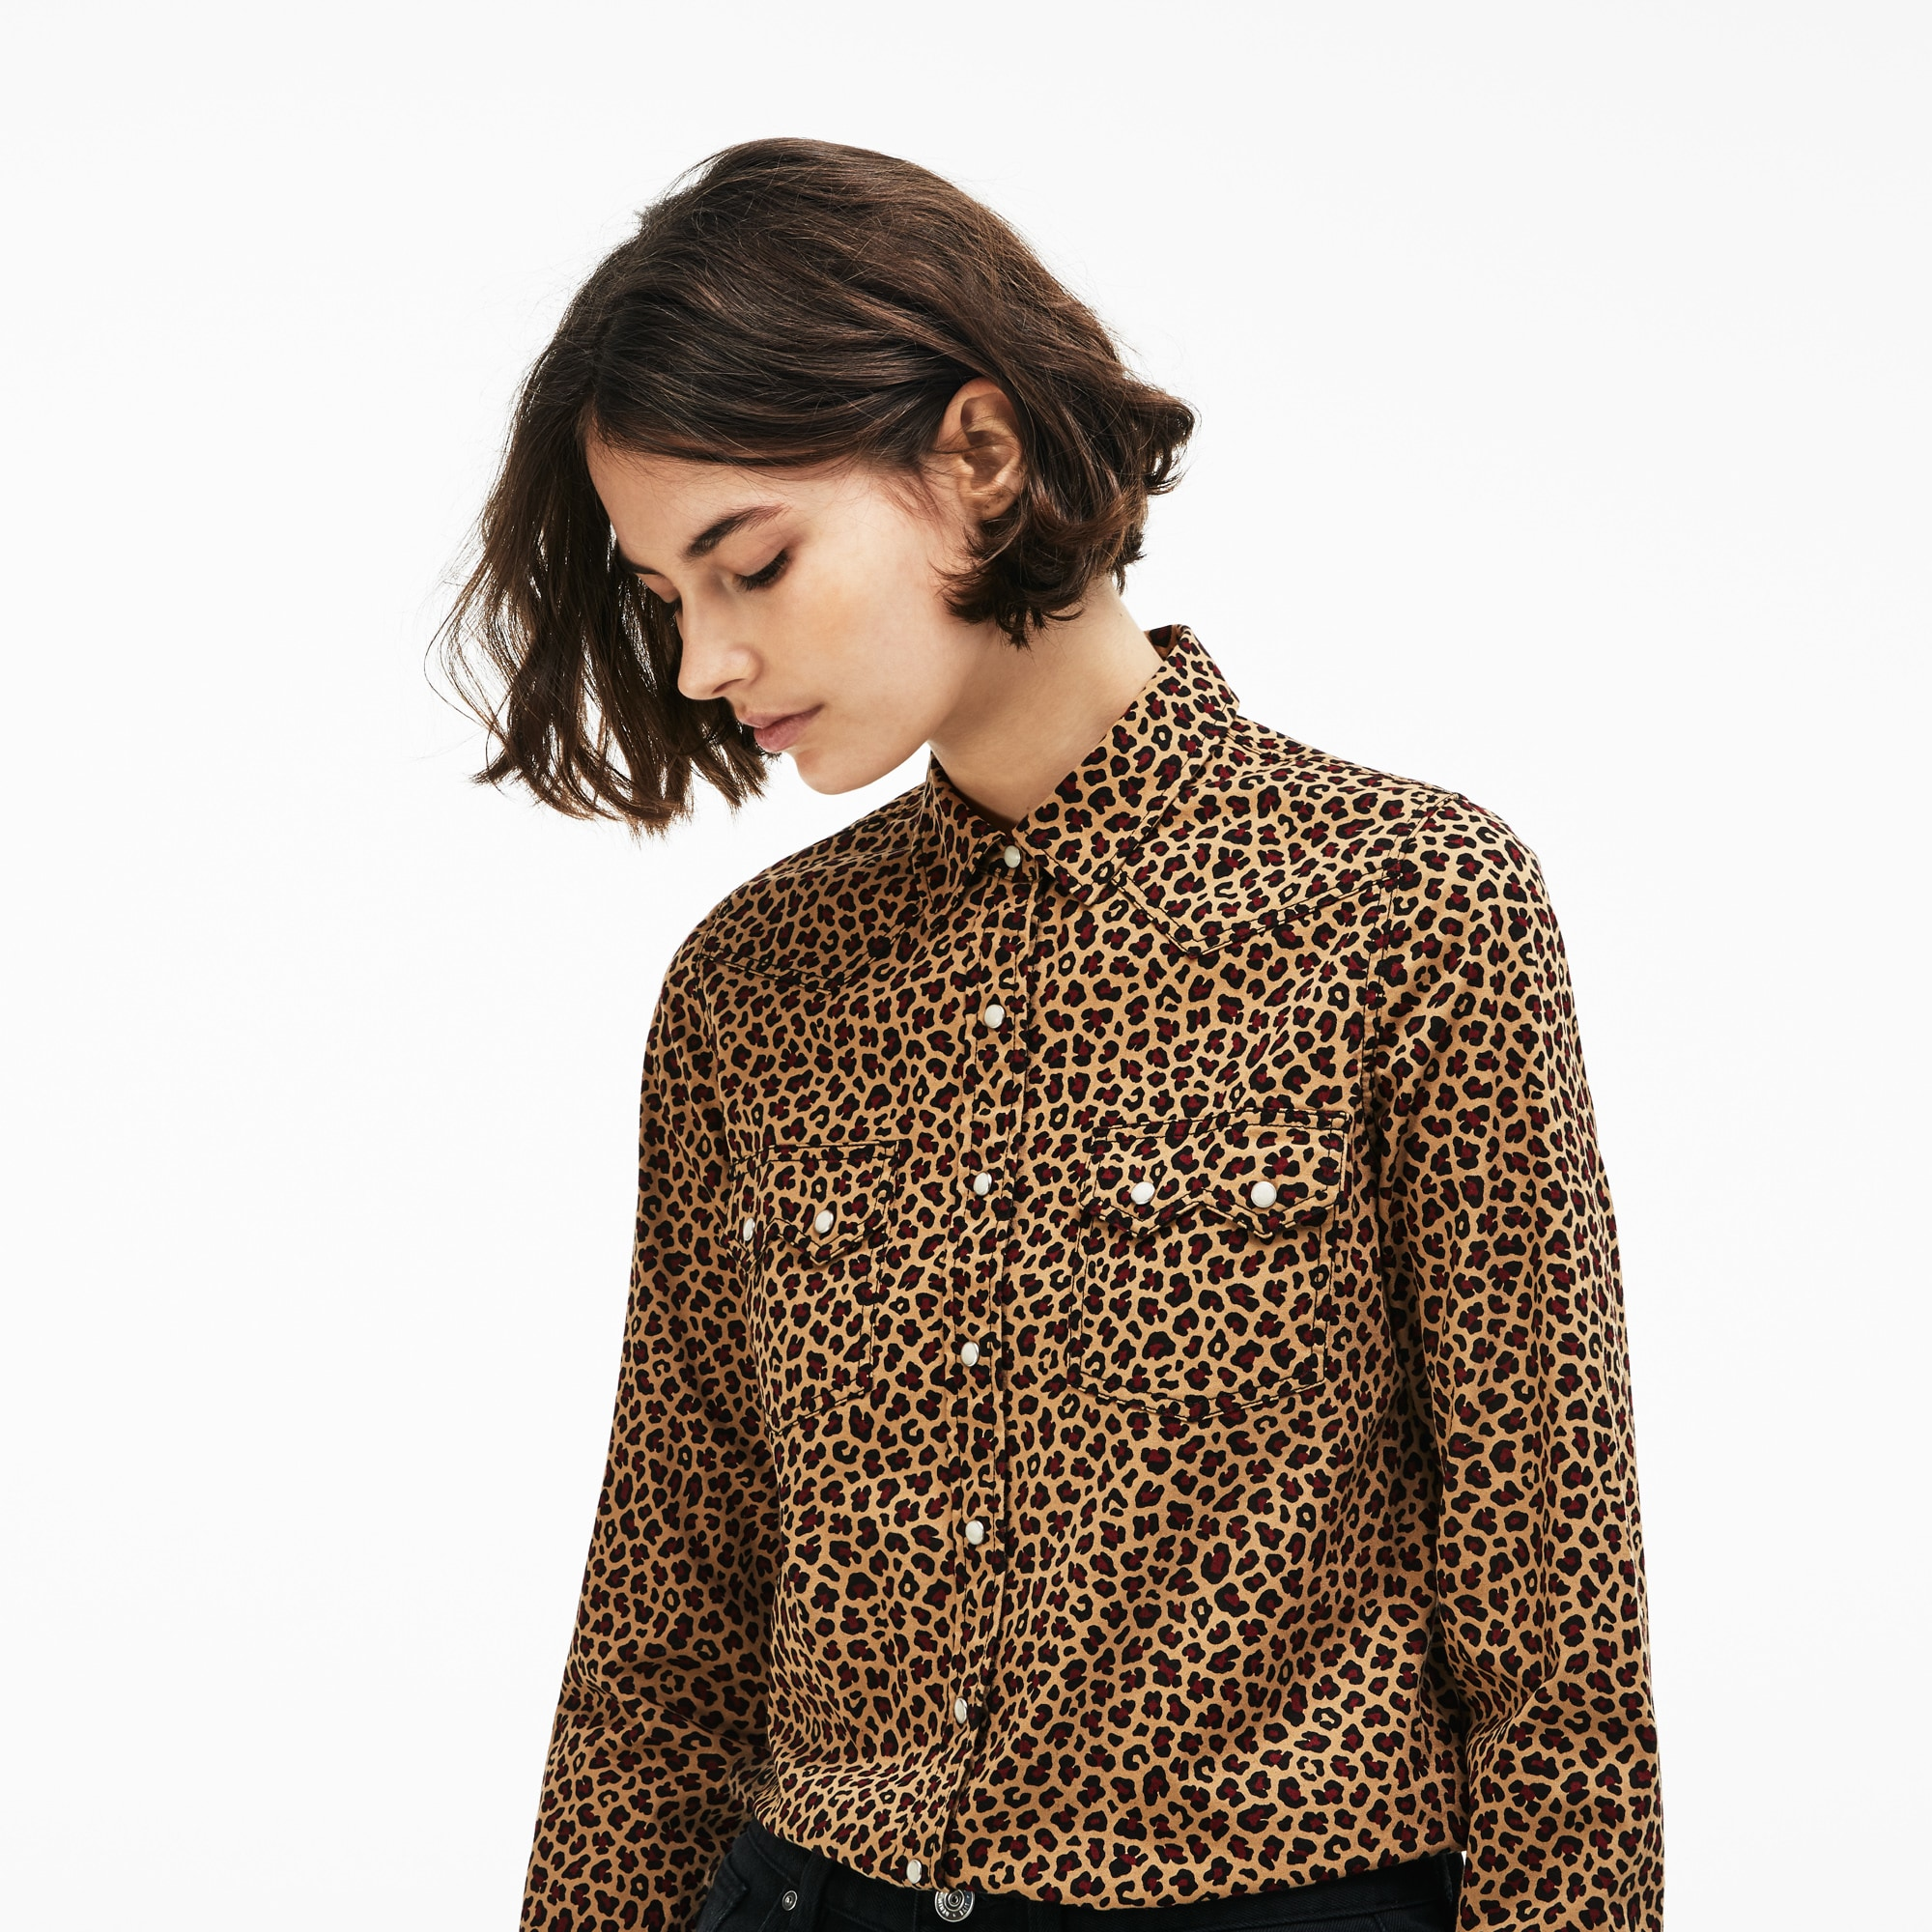 Women's Lacoste LIVE Slim Fit Leopard Print Stretch Twill Shirt